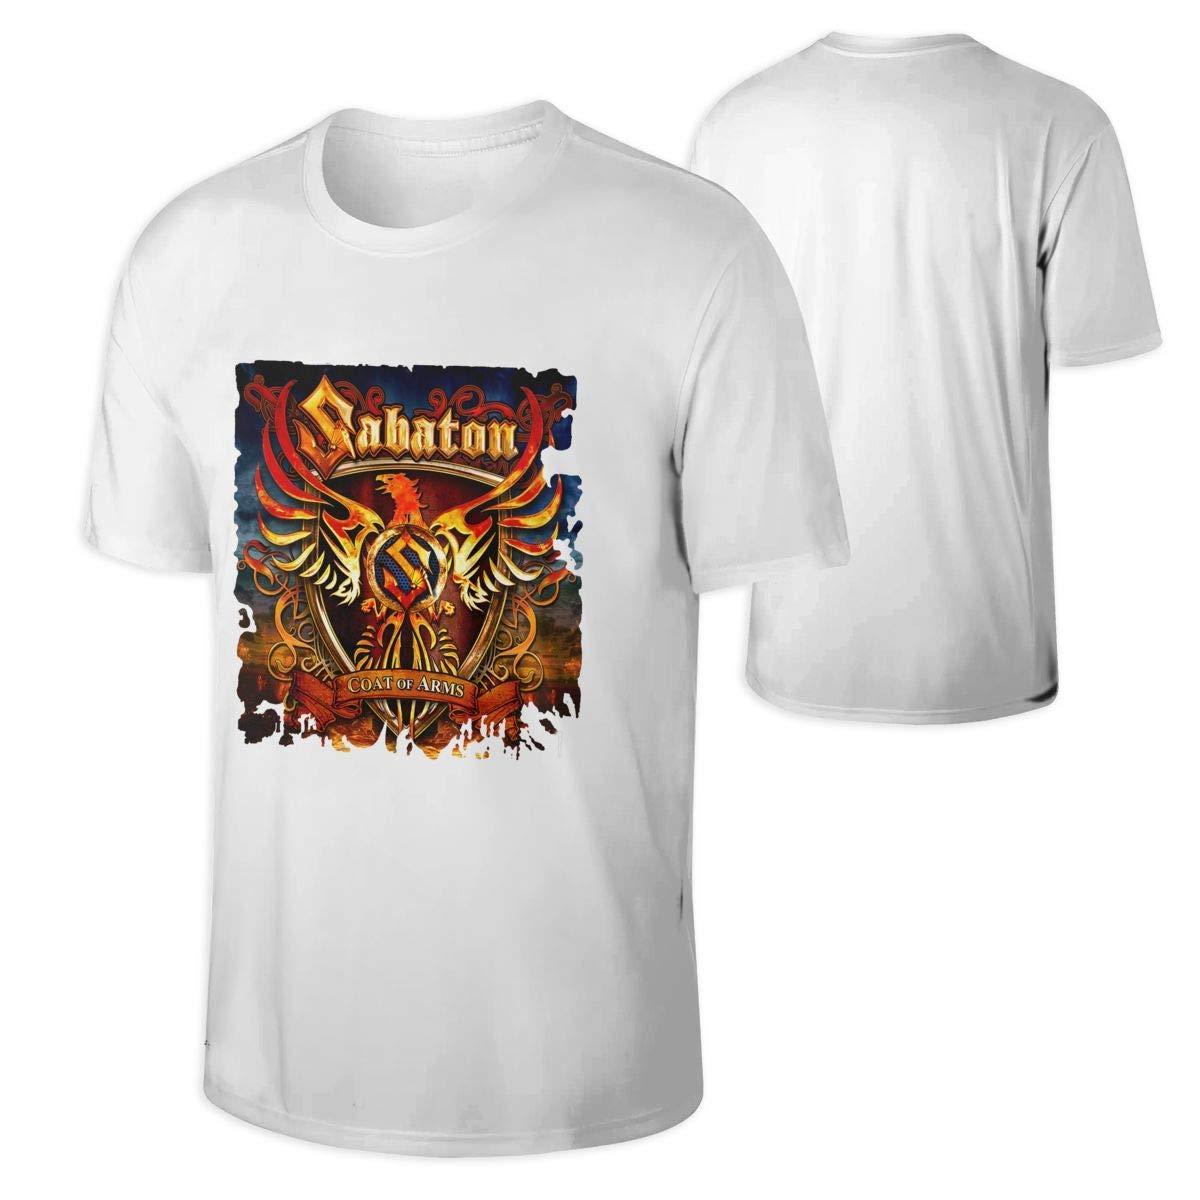 Cvvedcbf Mans Sabaton T Shirt Black,,4x-